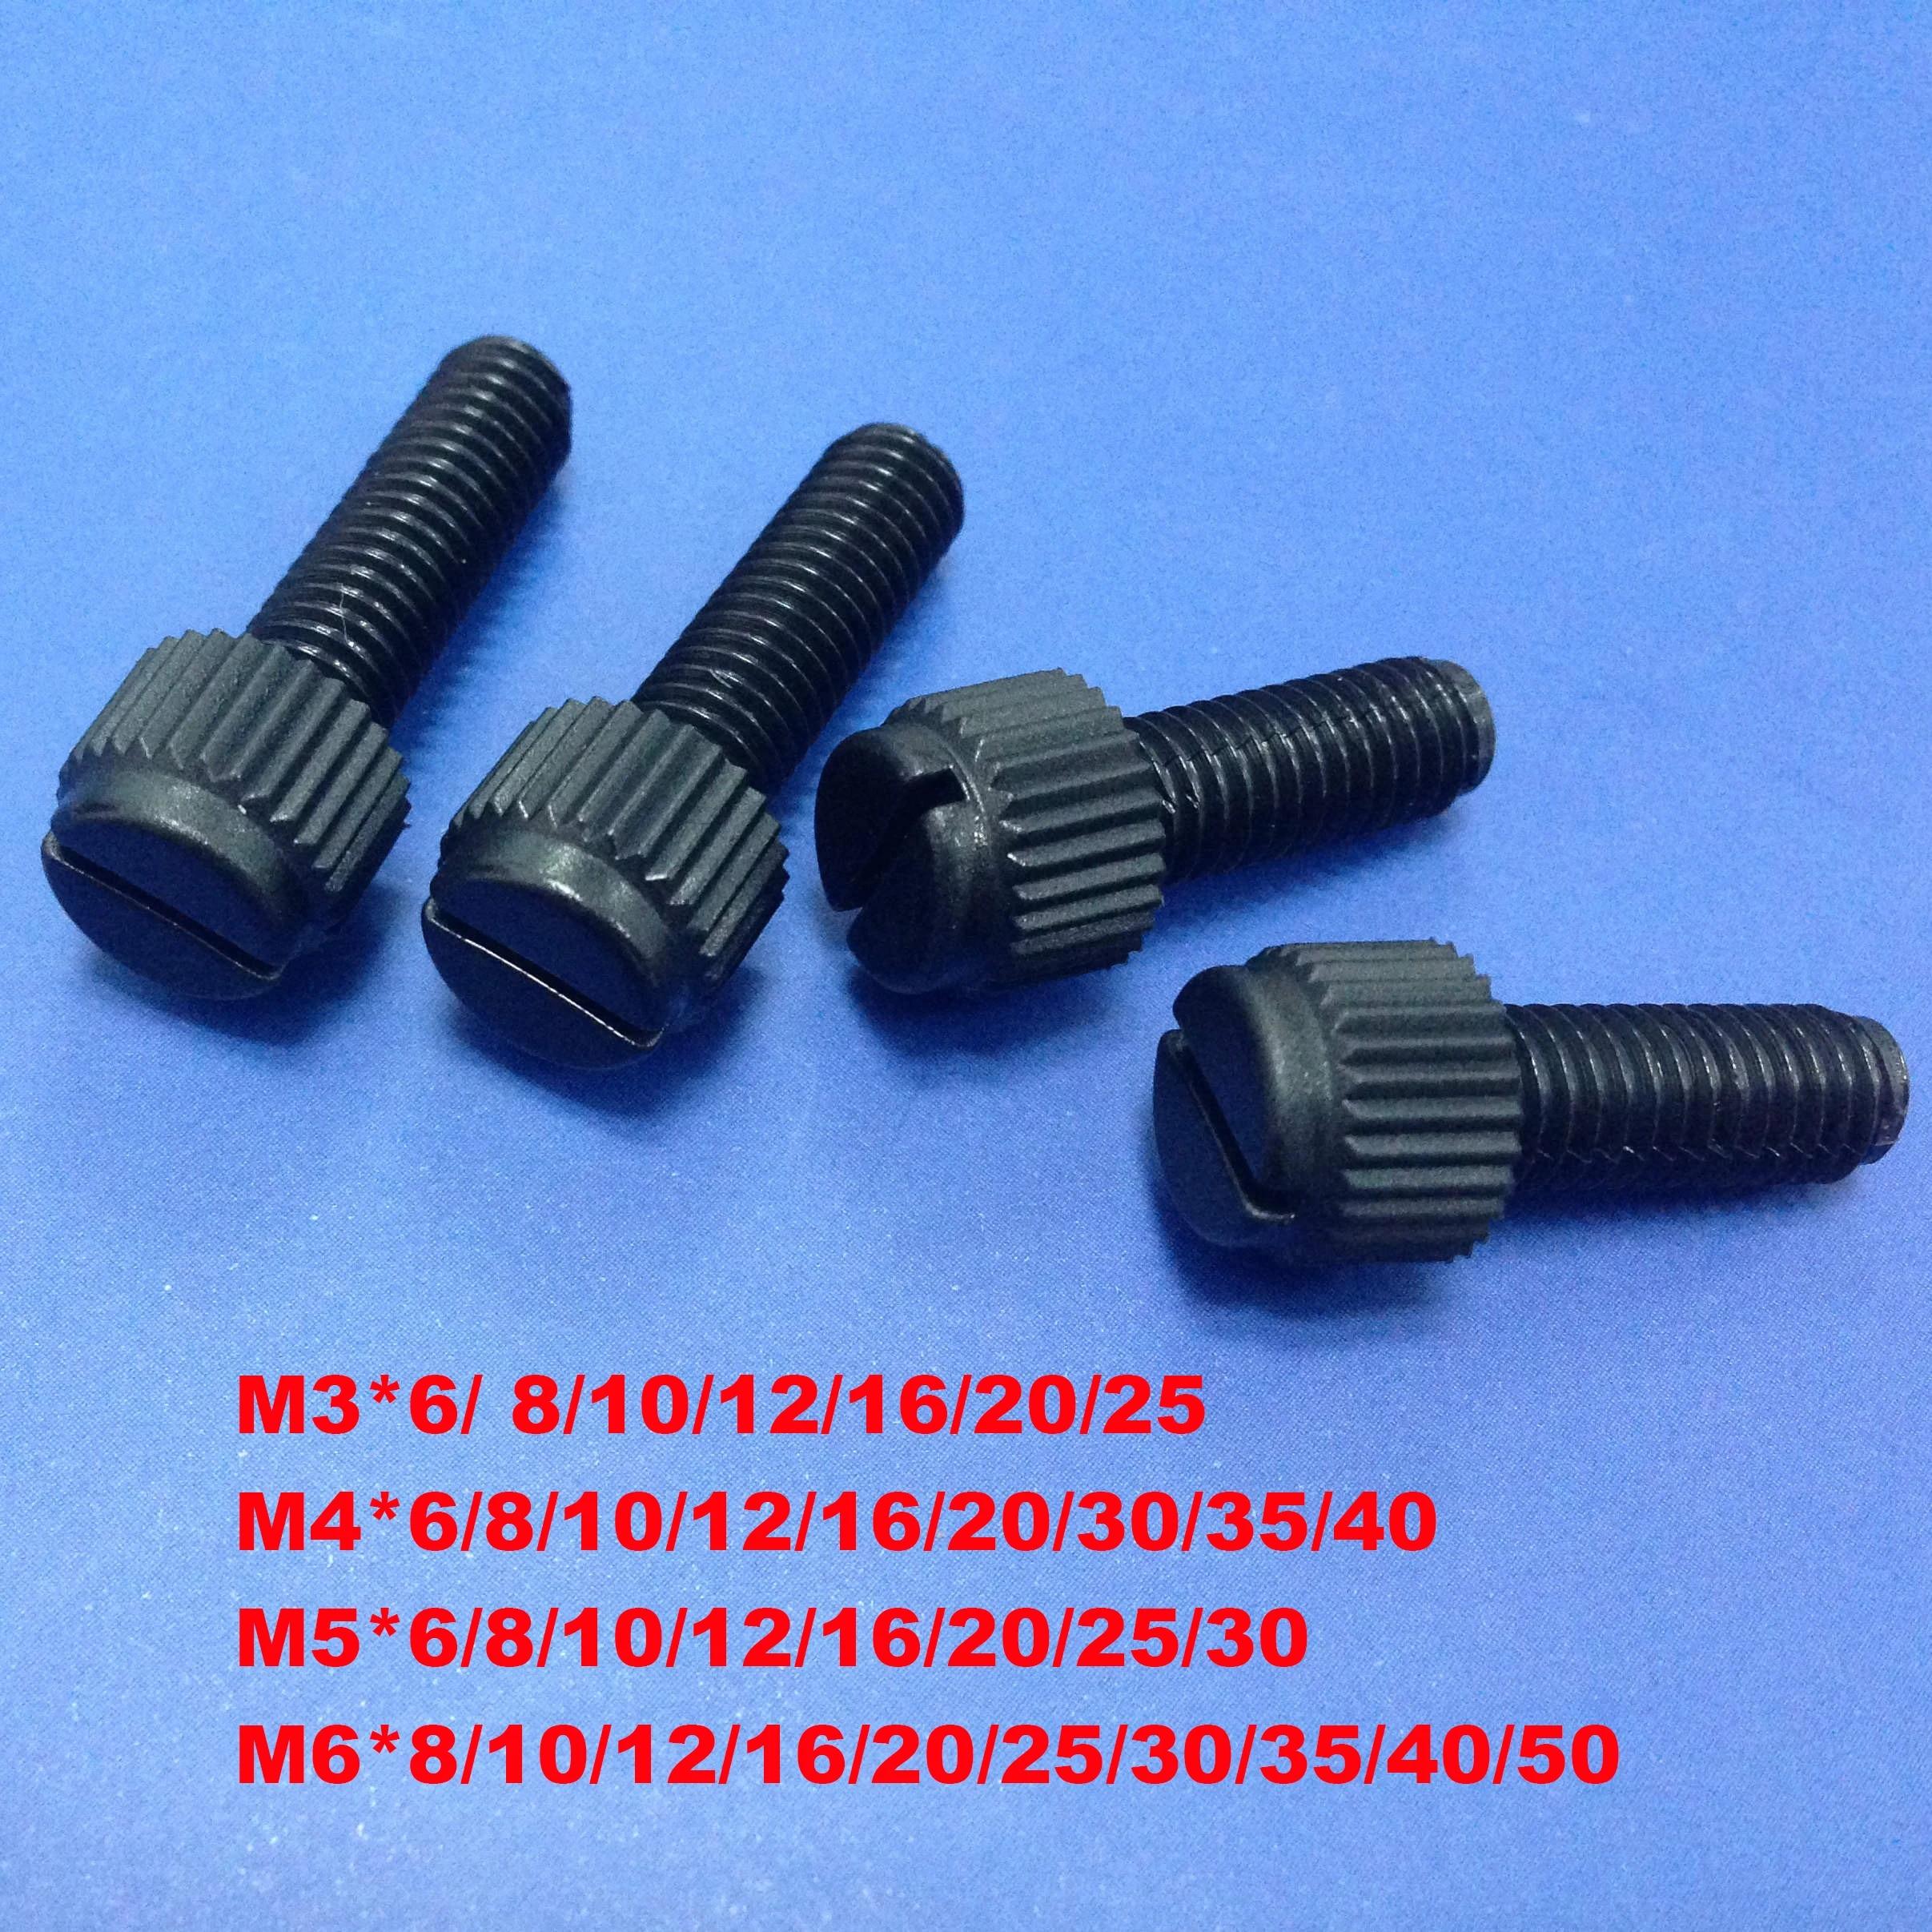 M8//M10*Head Dia.20mm Aluminum Alloy Knurled Thumb Nuts Pass Hole Hand Twist Nut